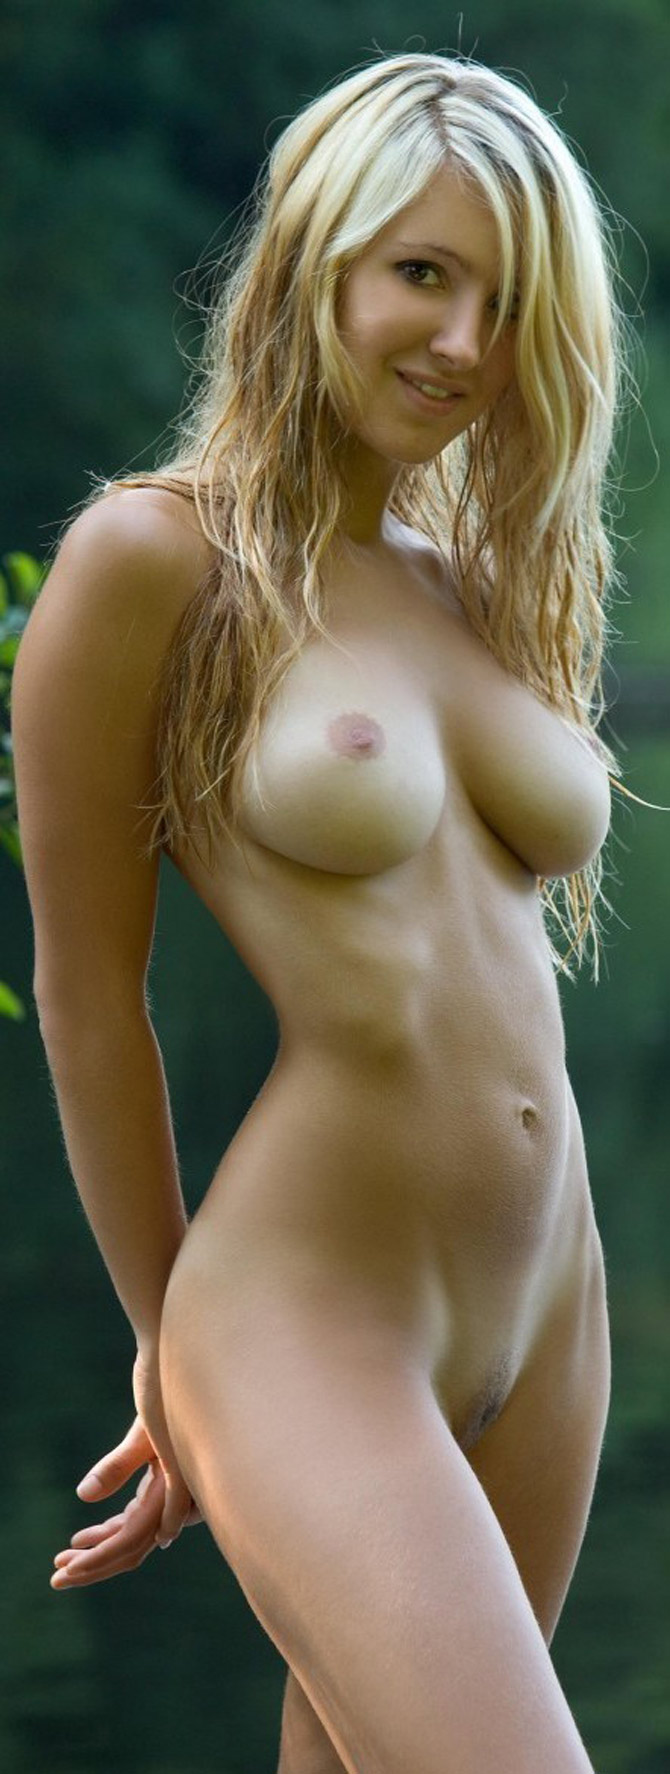 Belle lesbienne blonde nue